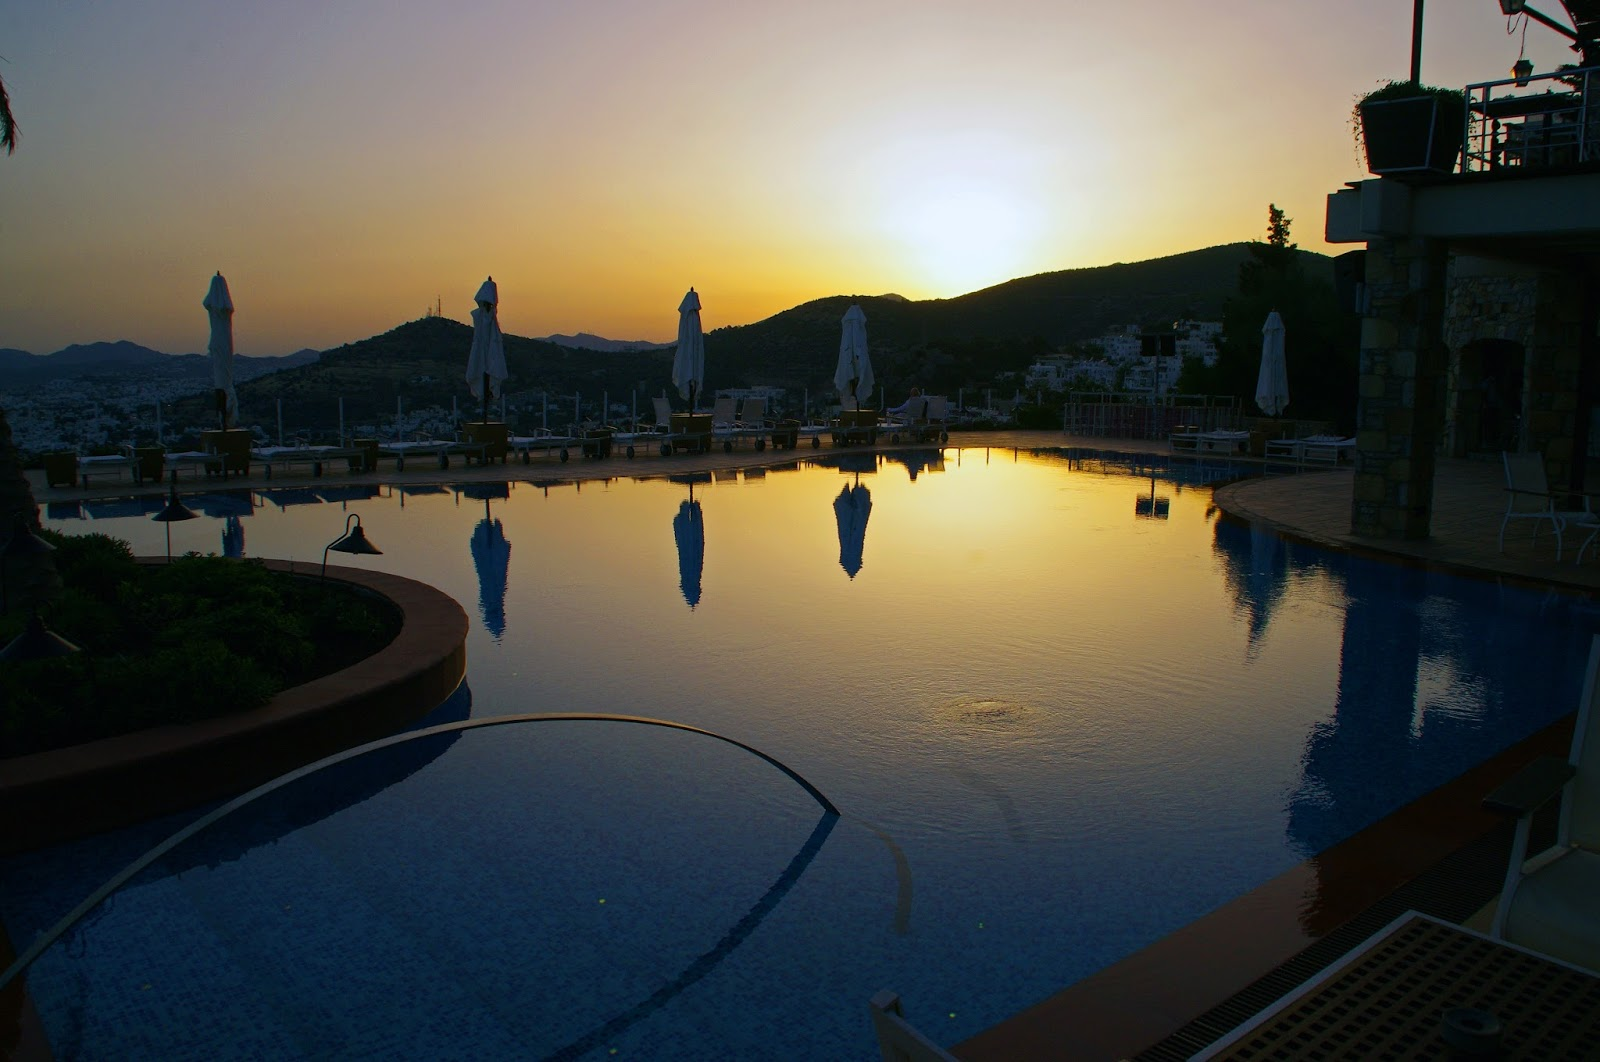 The Marmara Bodrum Swimming Pool at Sunset